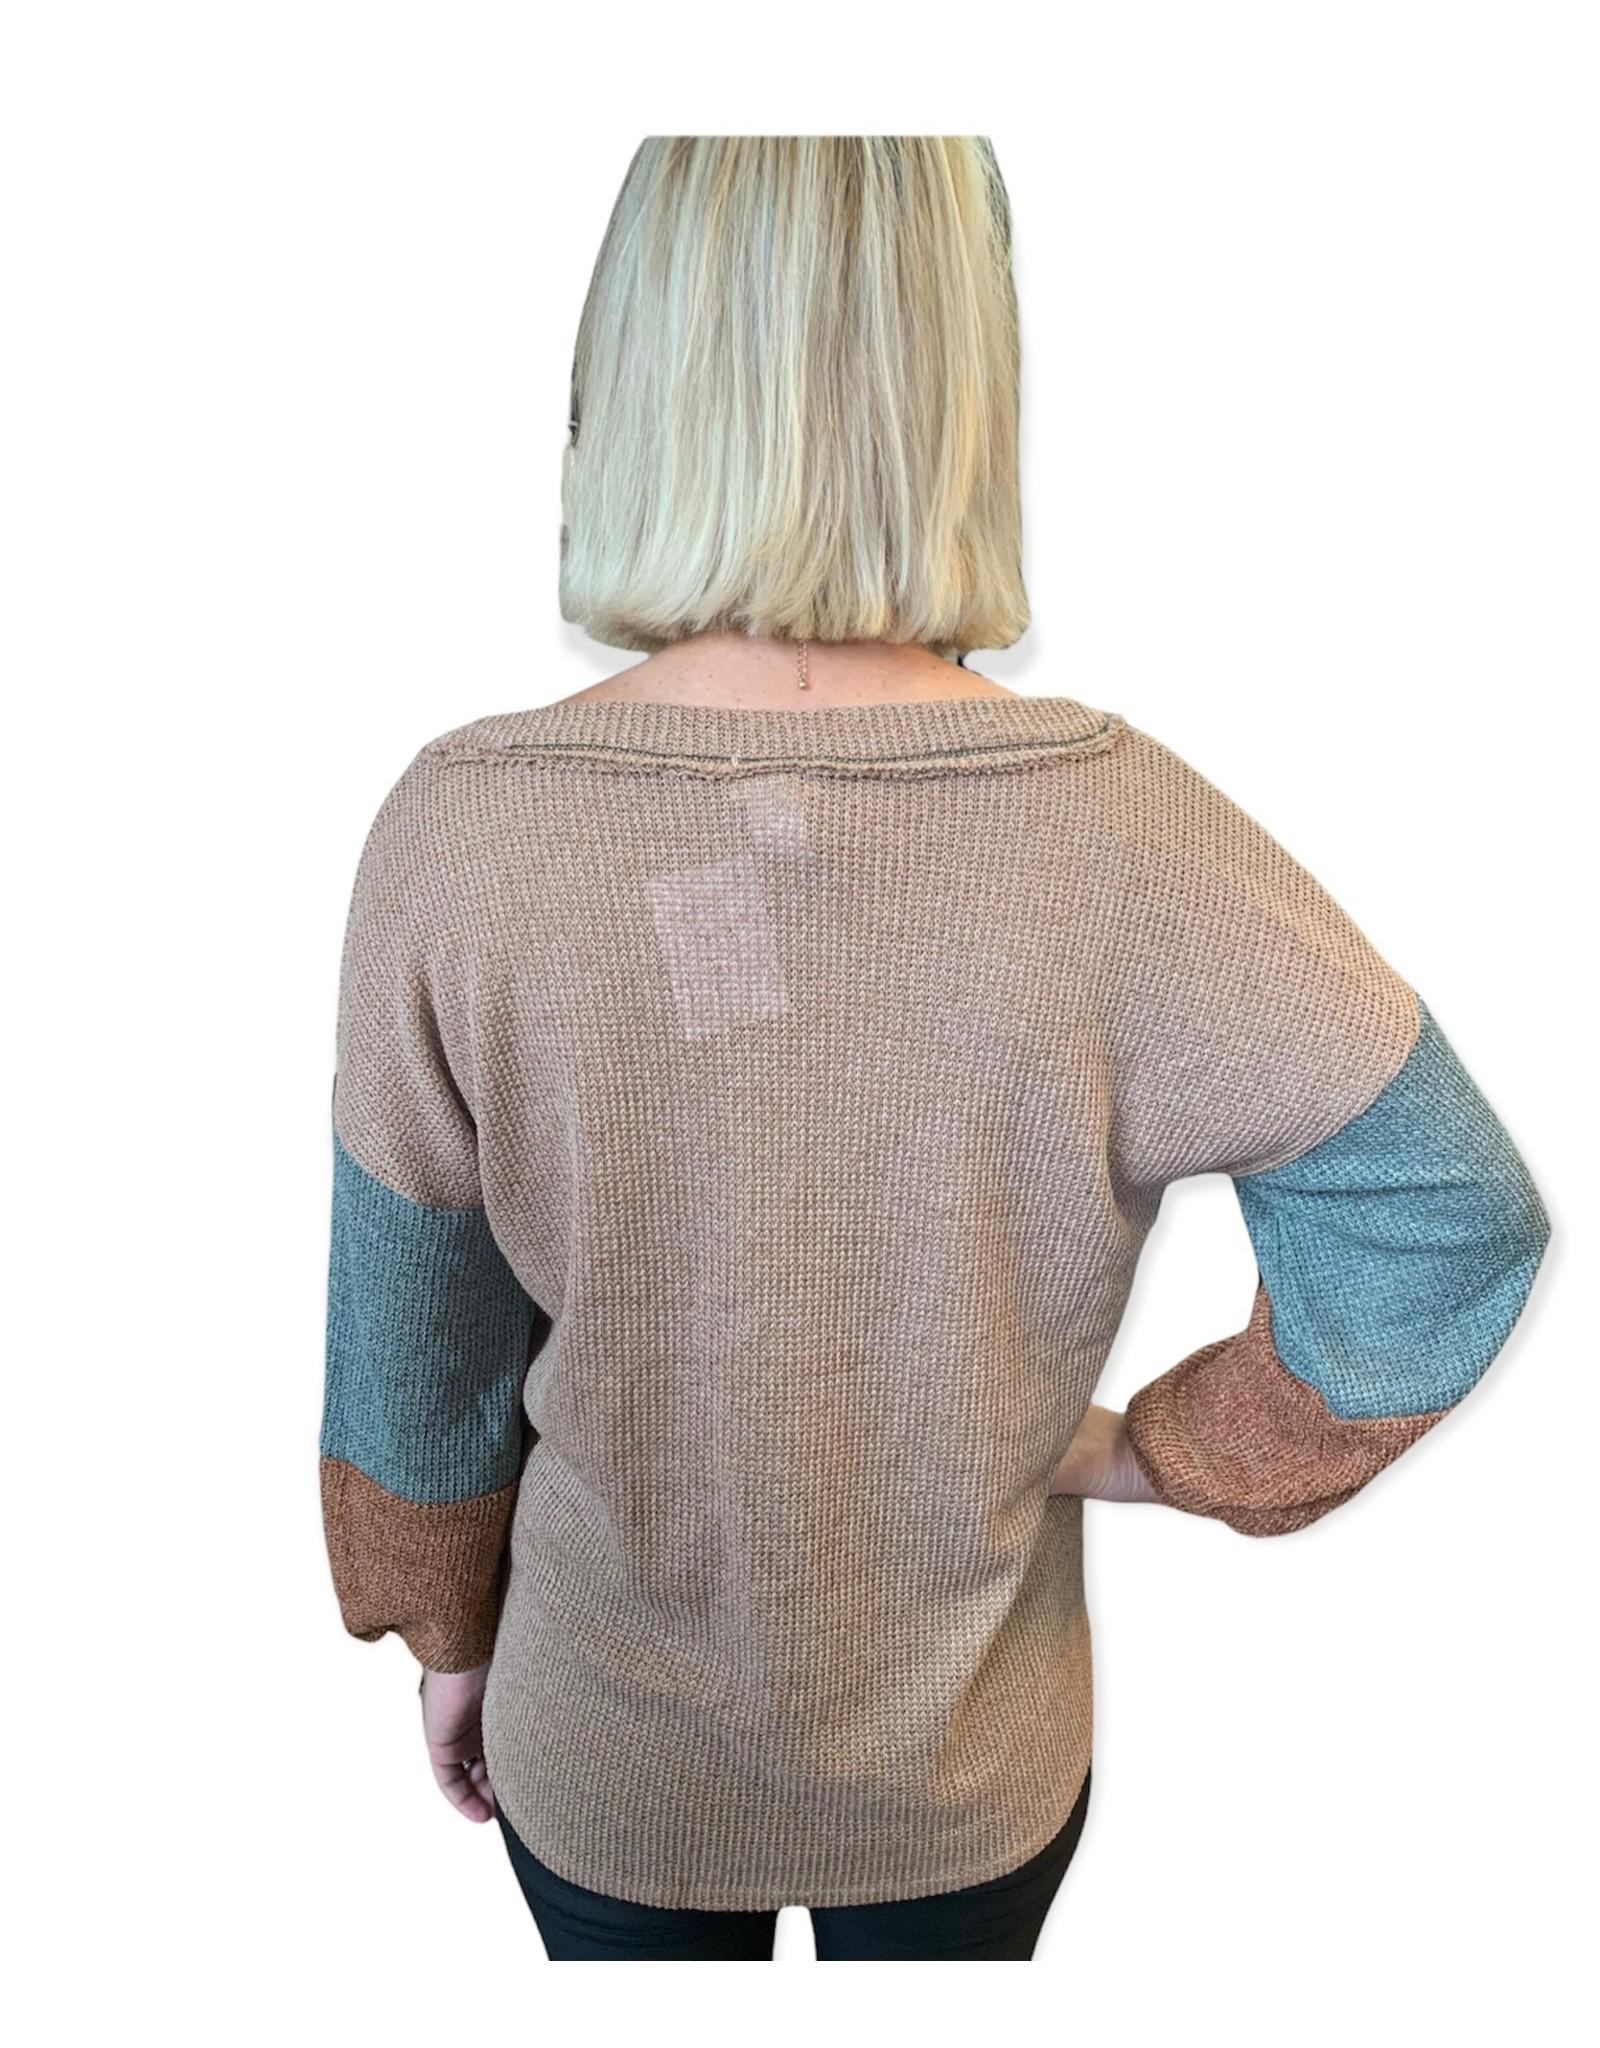 LATA Vintage Sweater Knit